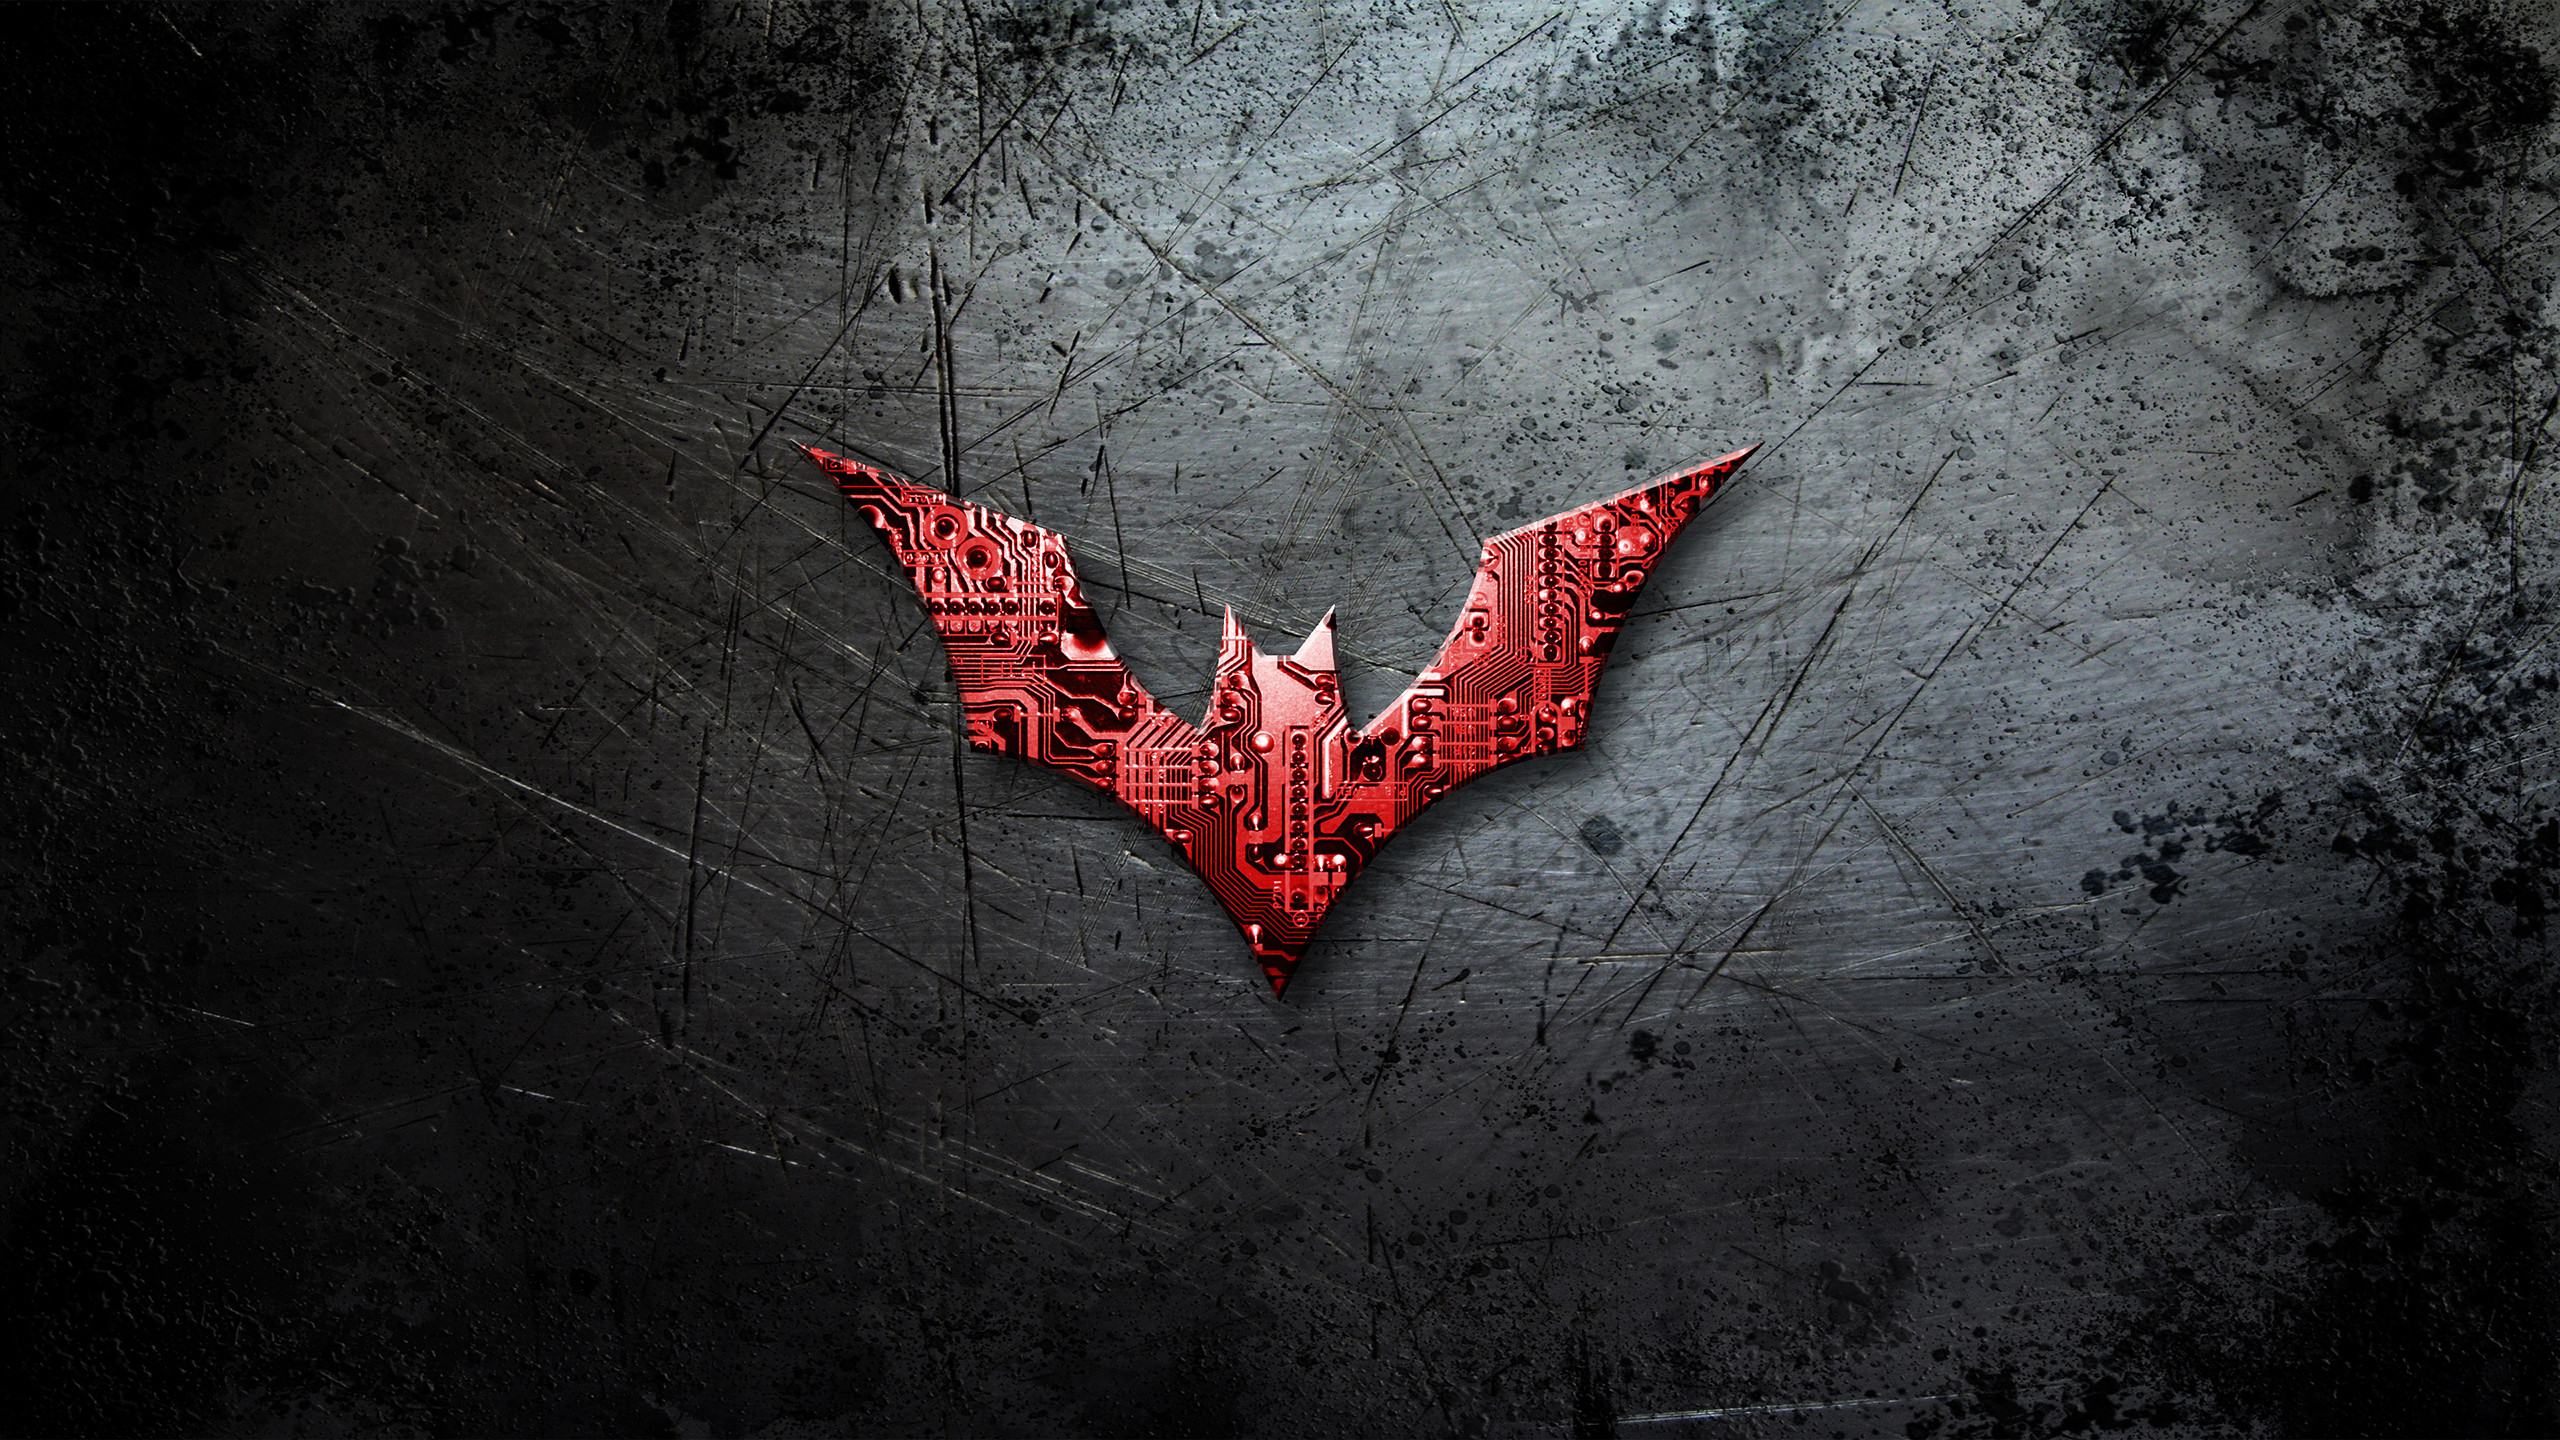 … hd wallpapers backgrounds; batman beyond wallpaper free download  pixelstalk net …